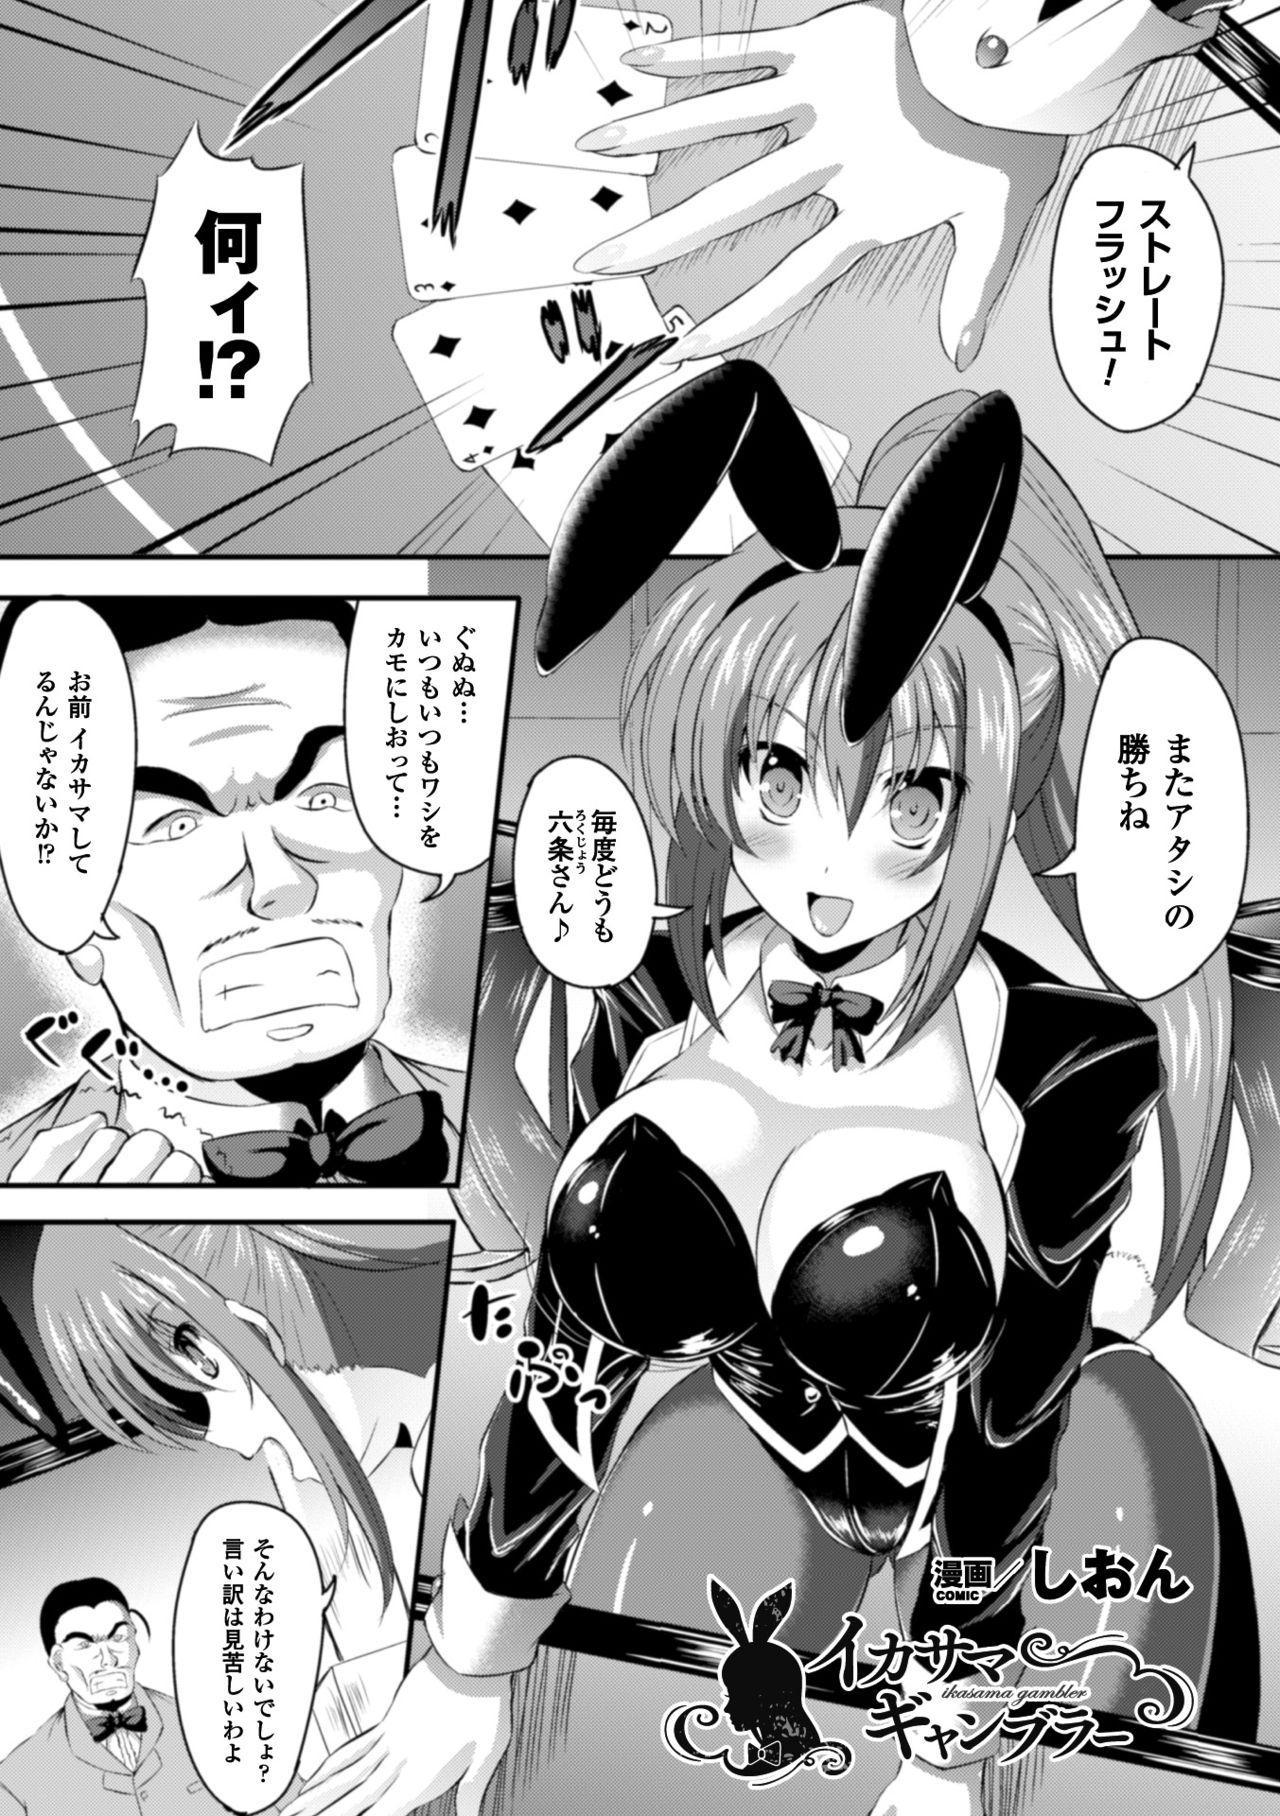 2D Comic Magazine Waki Feti Bunny Girl Vol. 1 66